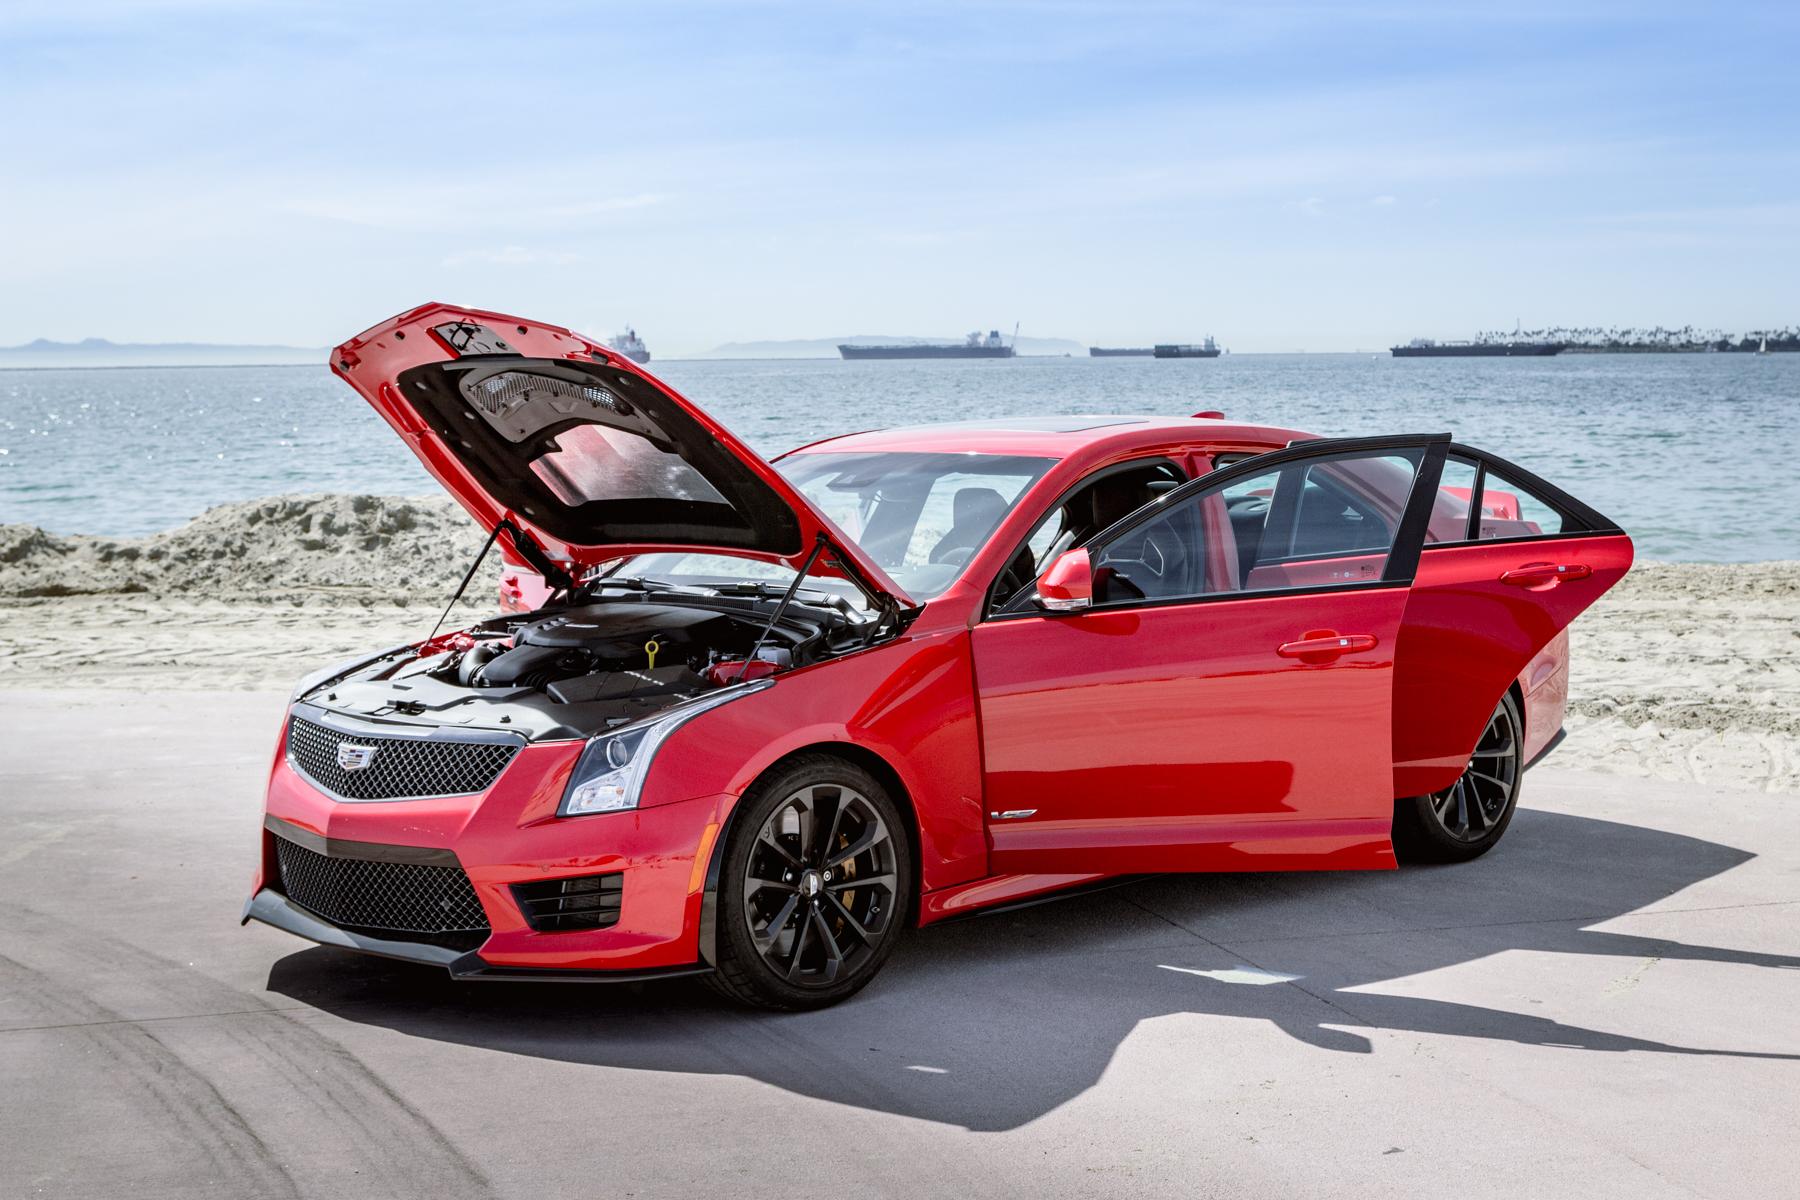 specs v driver and ats cadillac sedan price reviews photos car